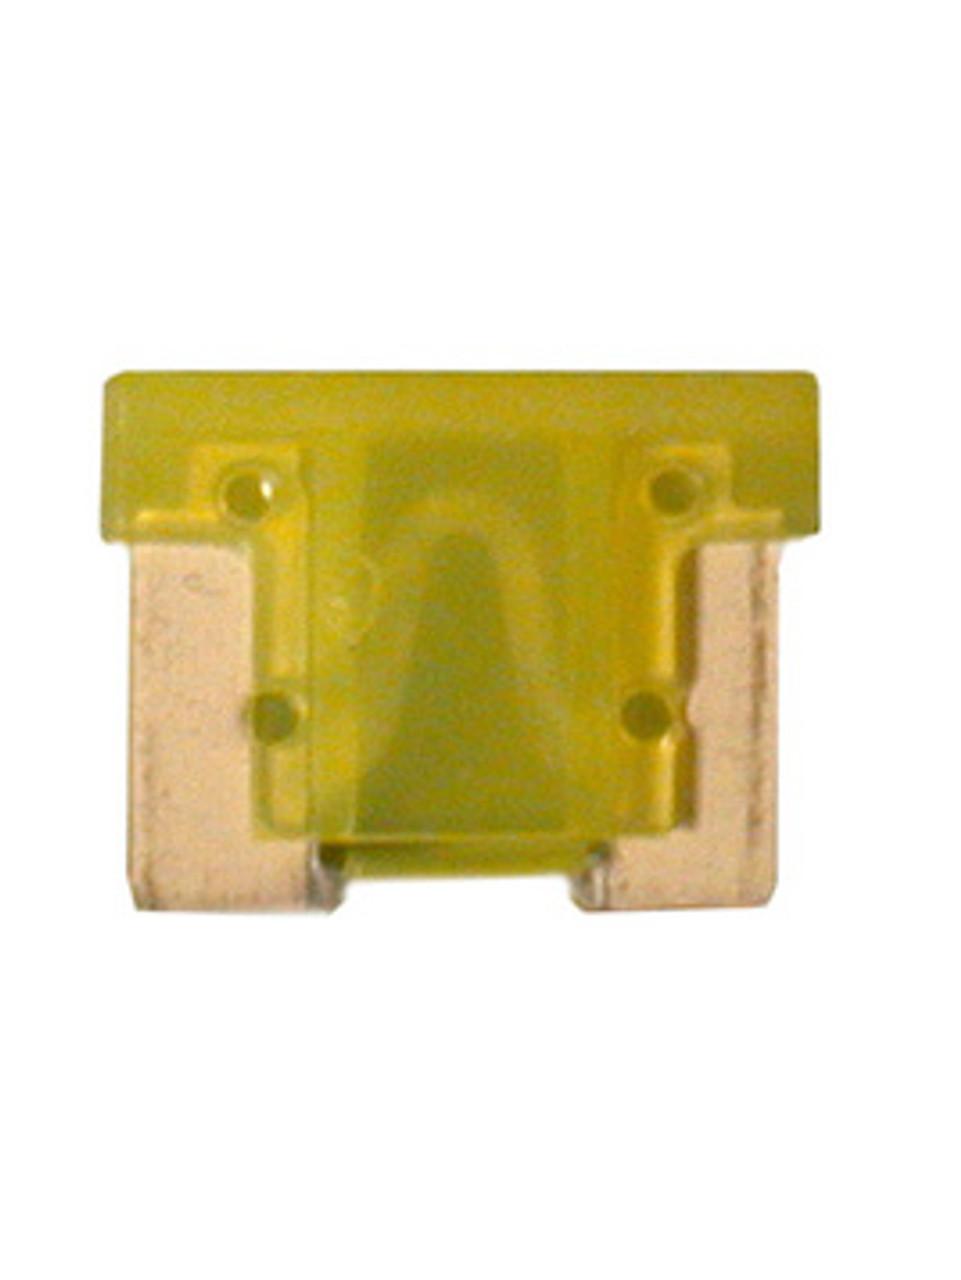 ATC20MLP --- Low Profile Mini Fuses